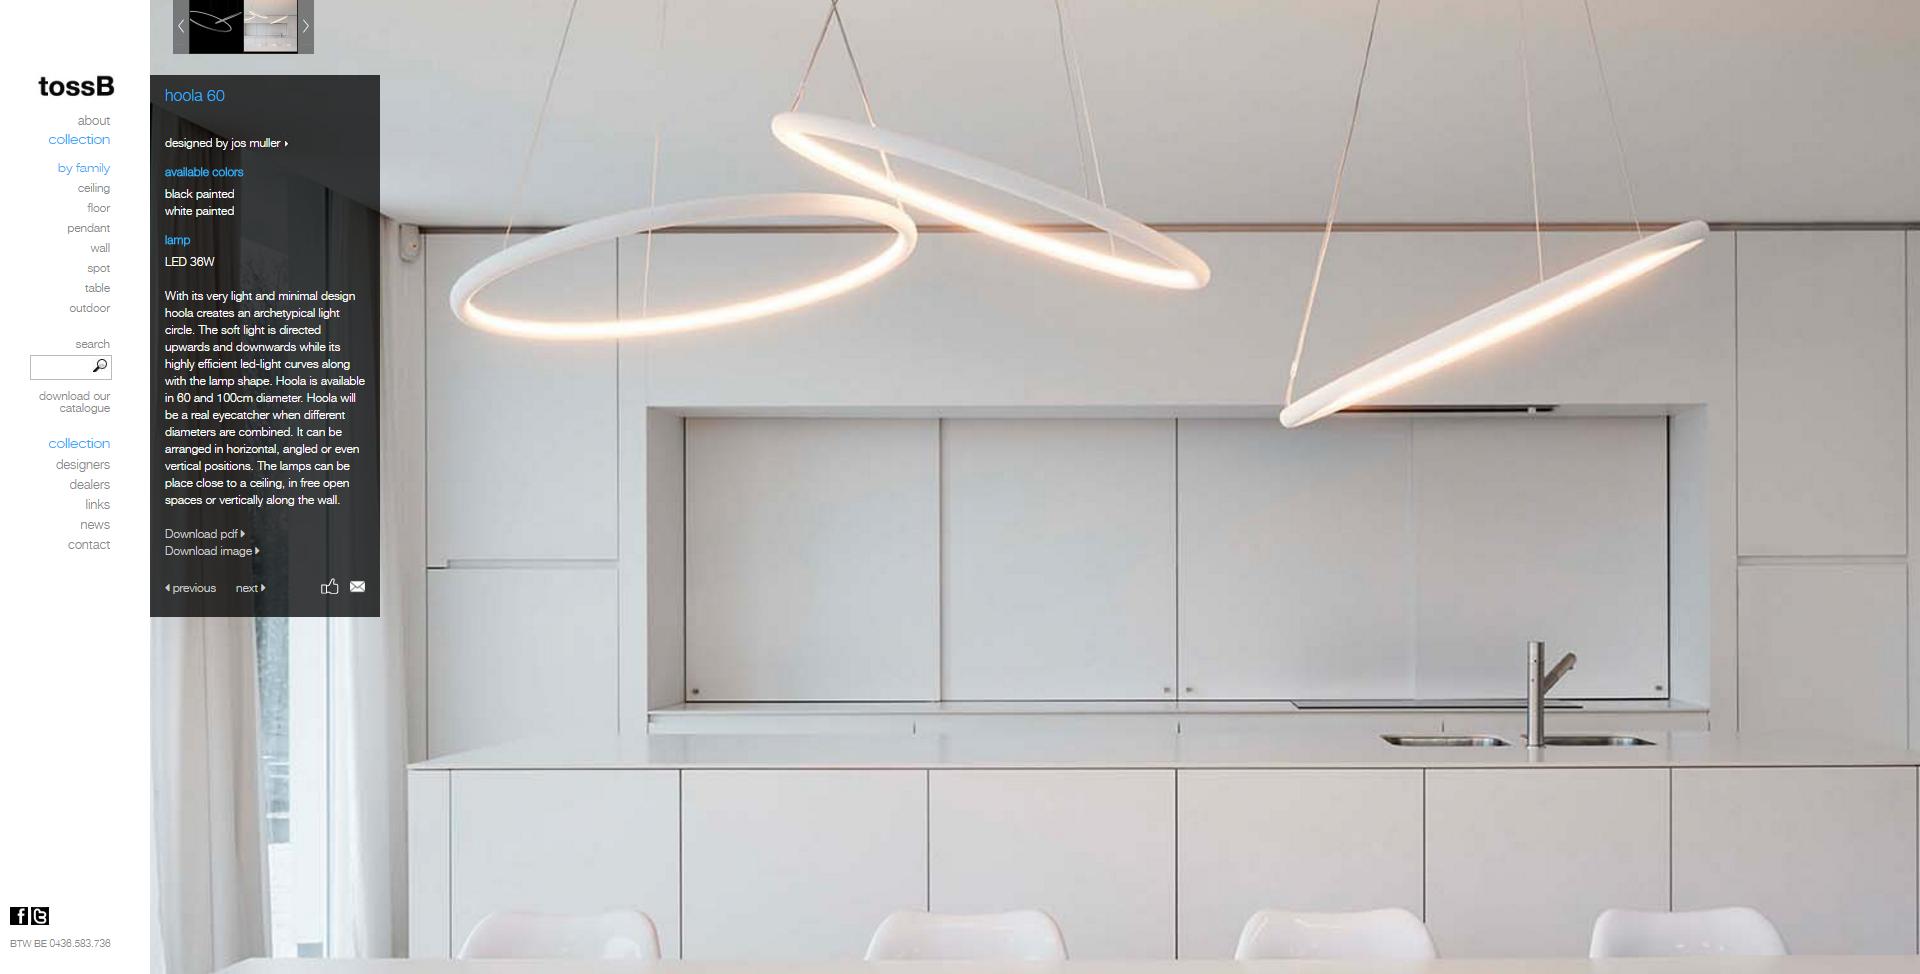 Hoola 60 Tossb Lamp Details Pictures Technical Info Architectural Led Lighting Led Lighting Solutions Pendant Lamp Design